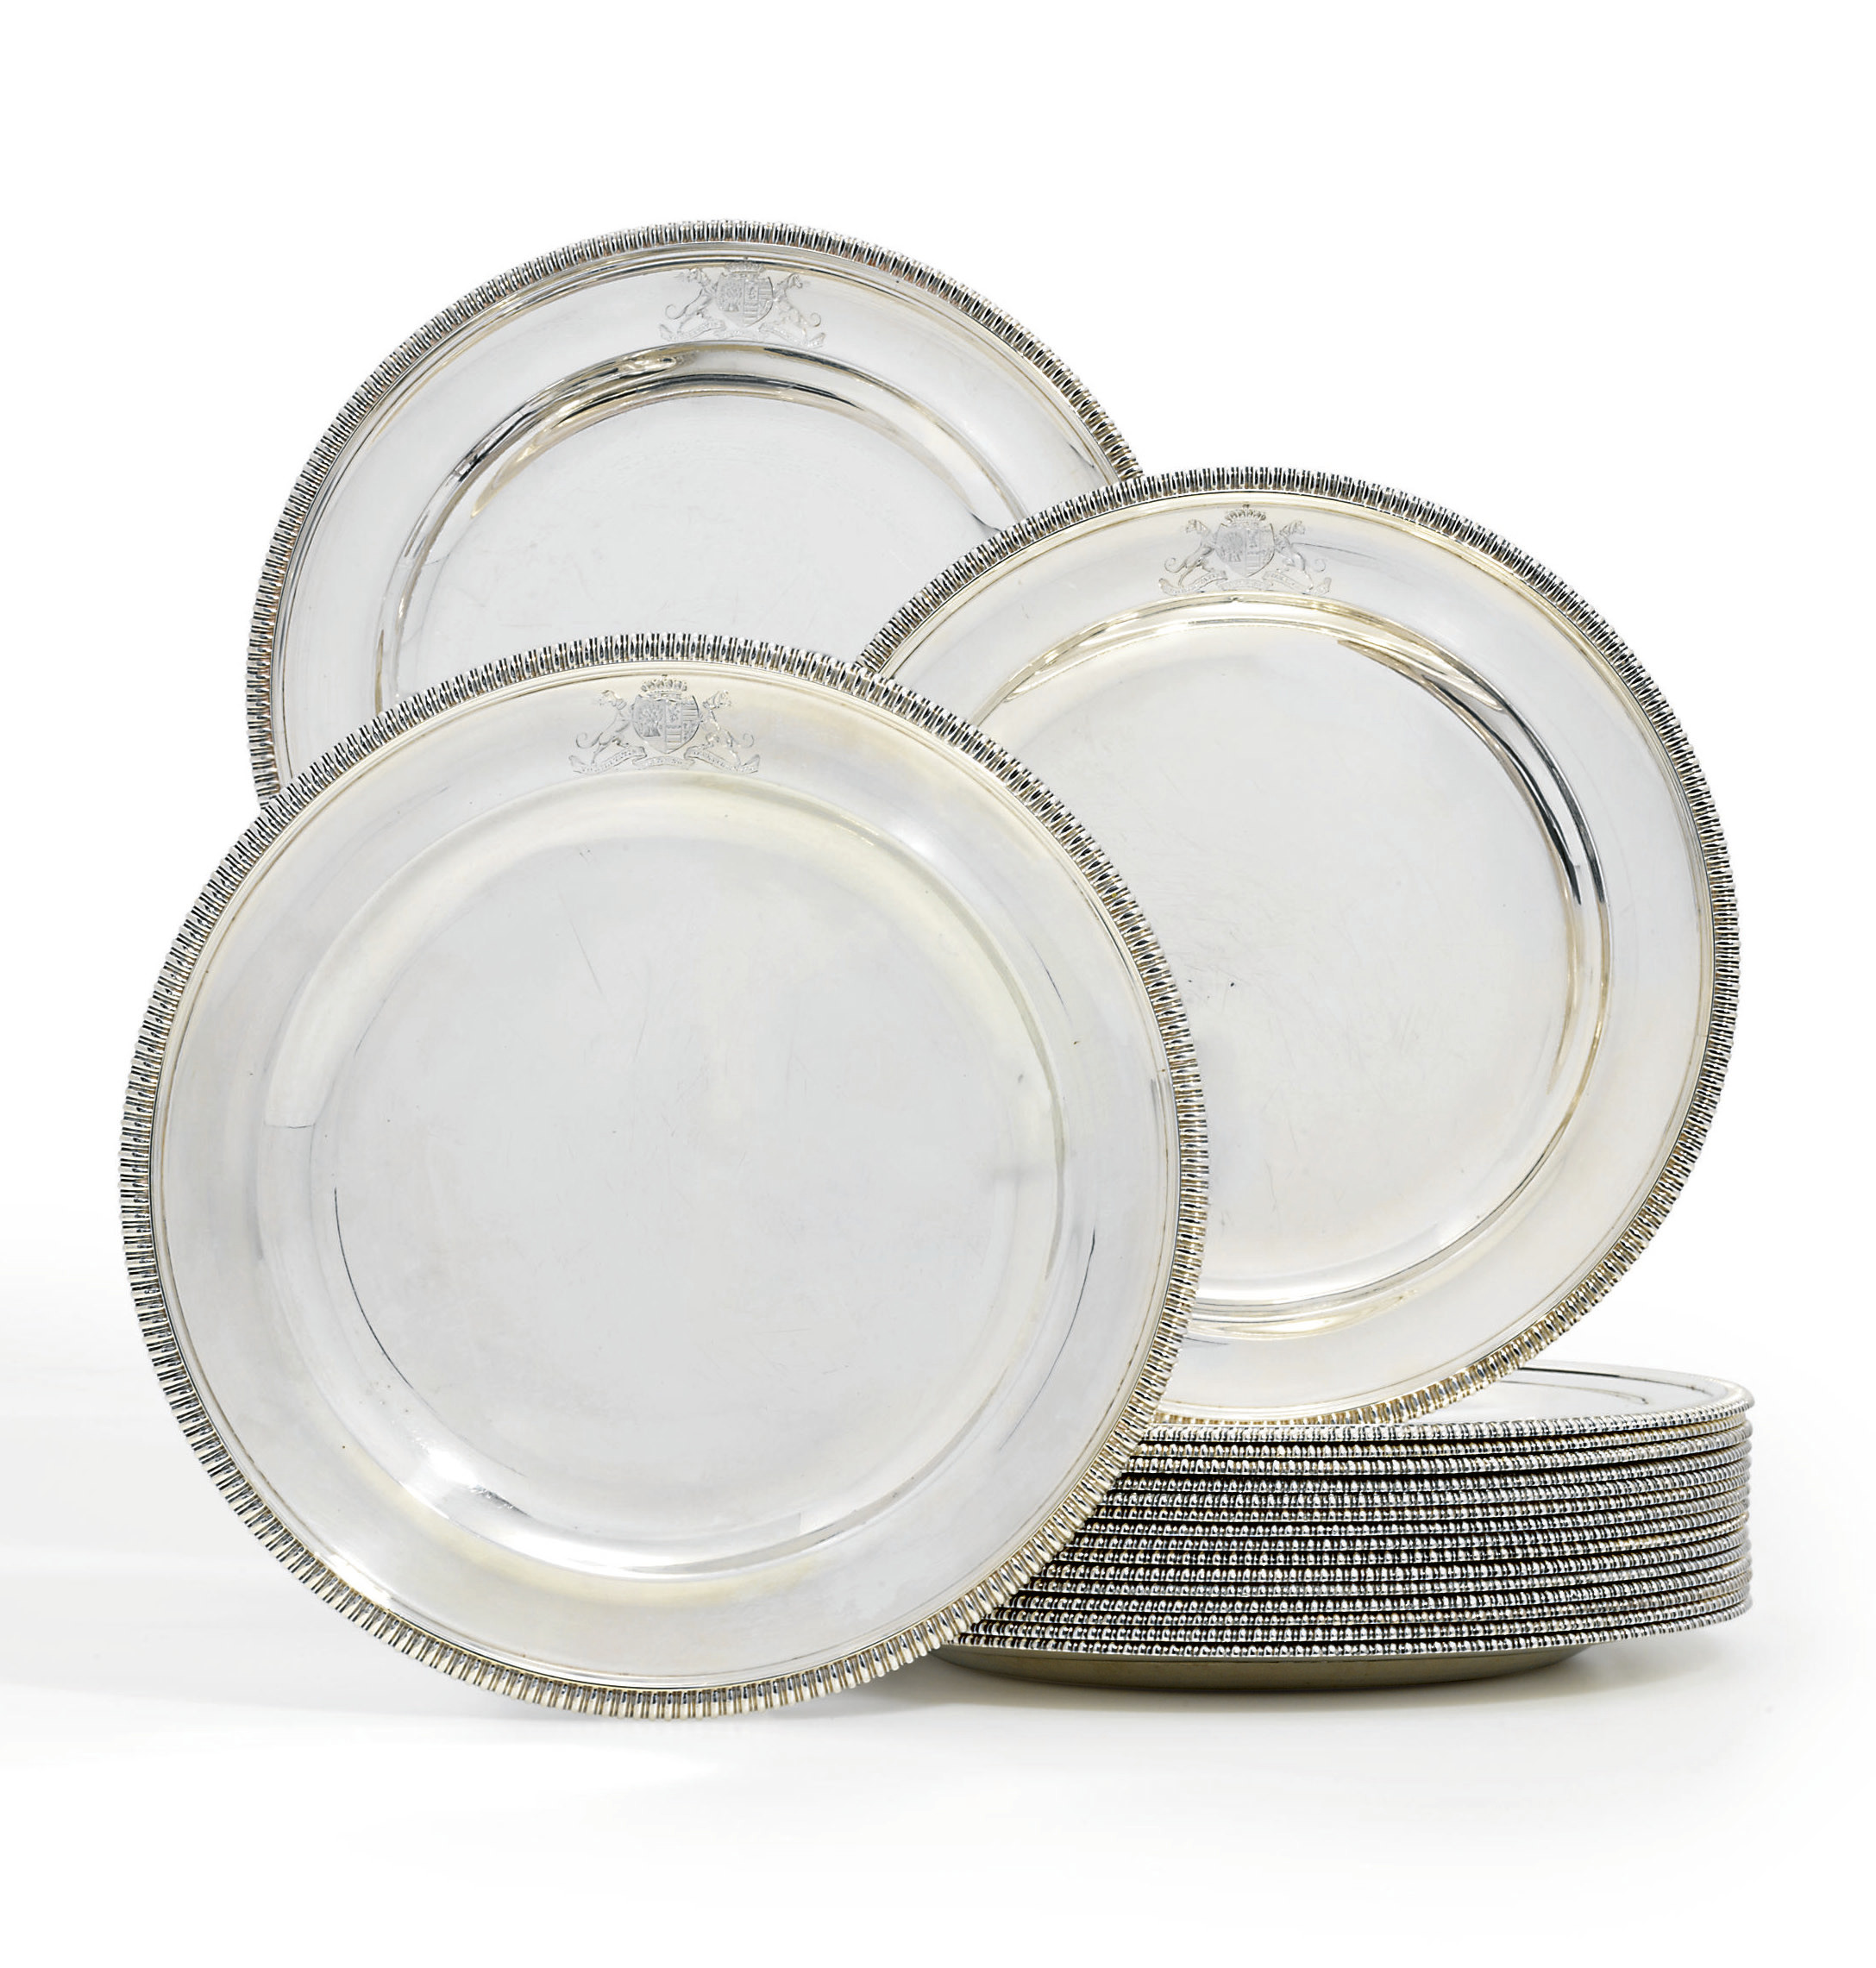 A SET OF EIGHTEEN GEORGE III SILVER DINNER-PLATES